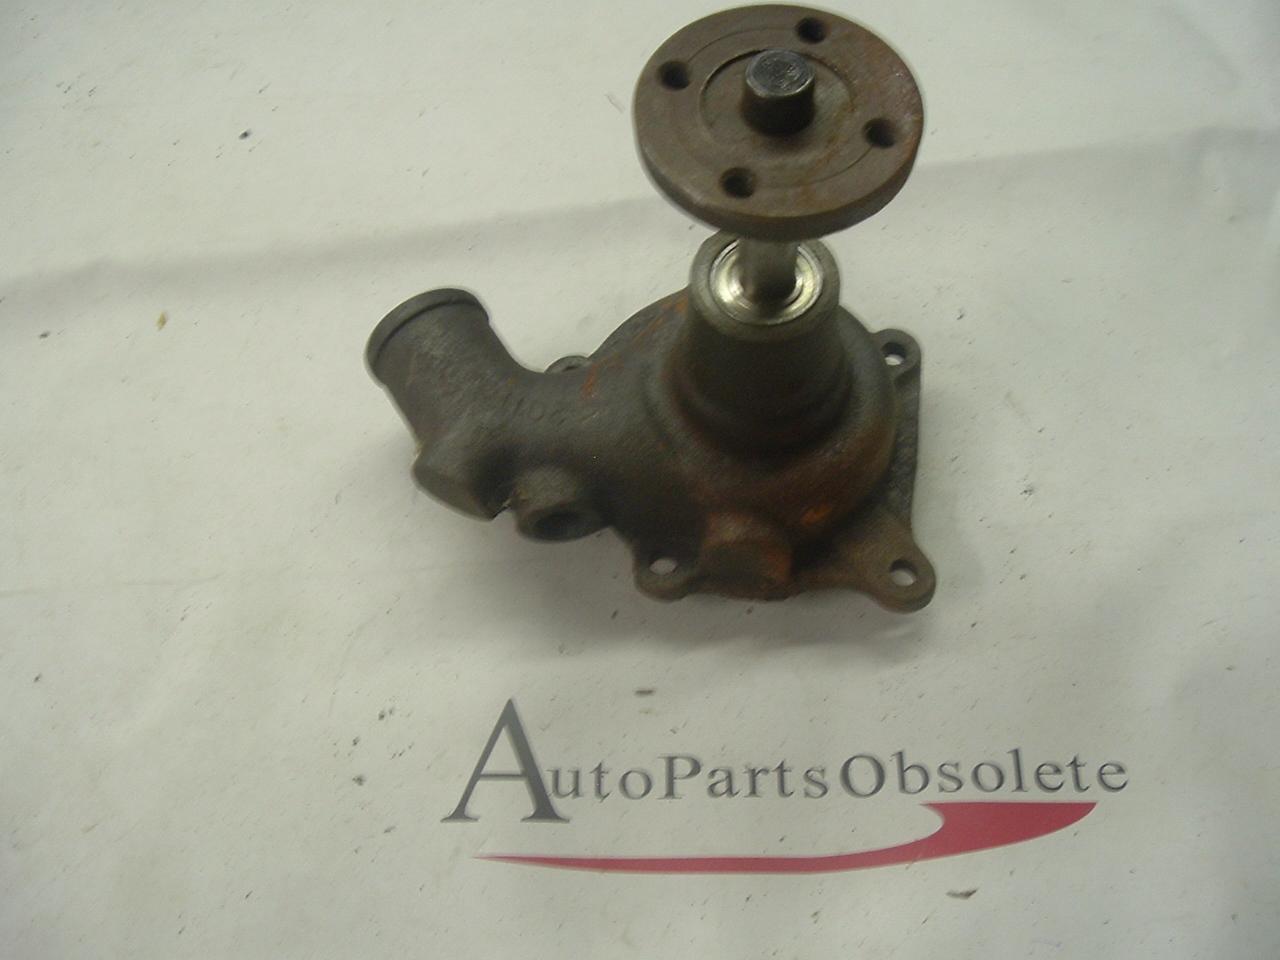 1958 1959 60 6162 Rambler Classic 6 water pump new (A wn1367a)